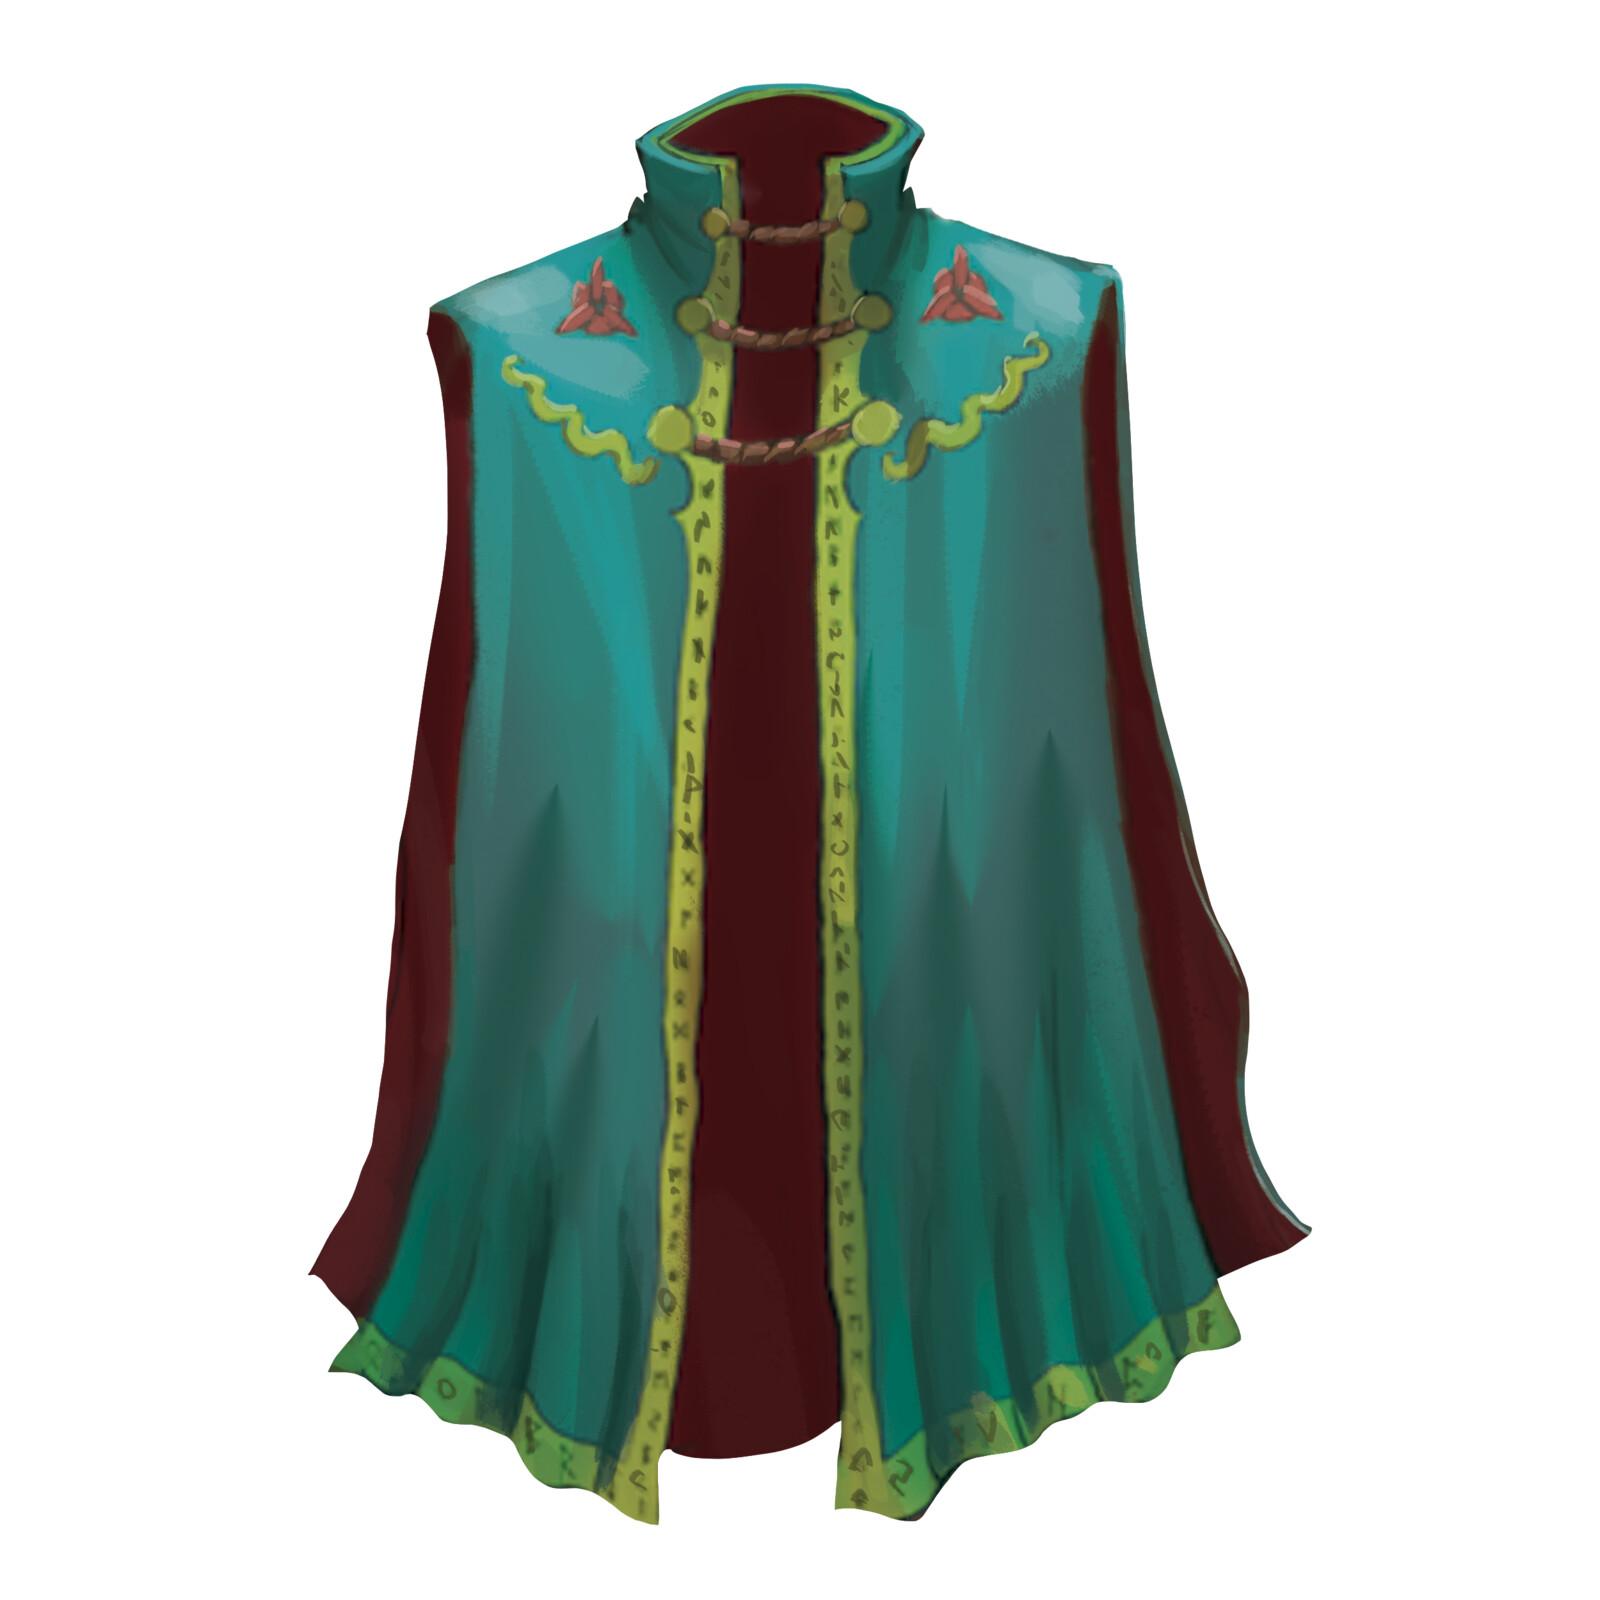 Defender's Cloak